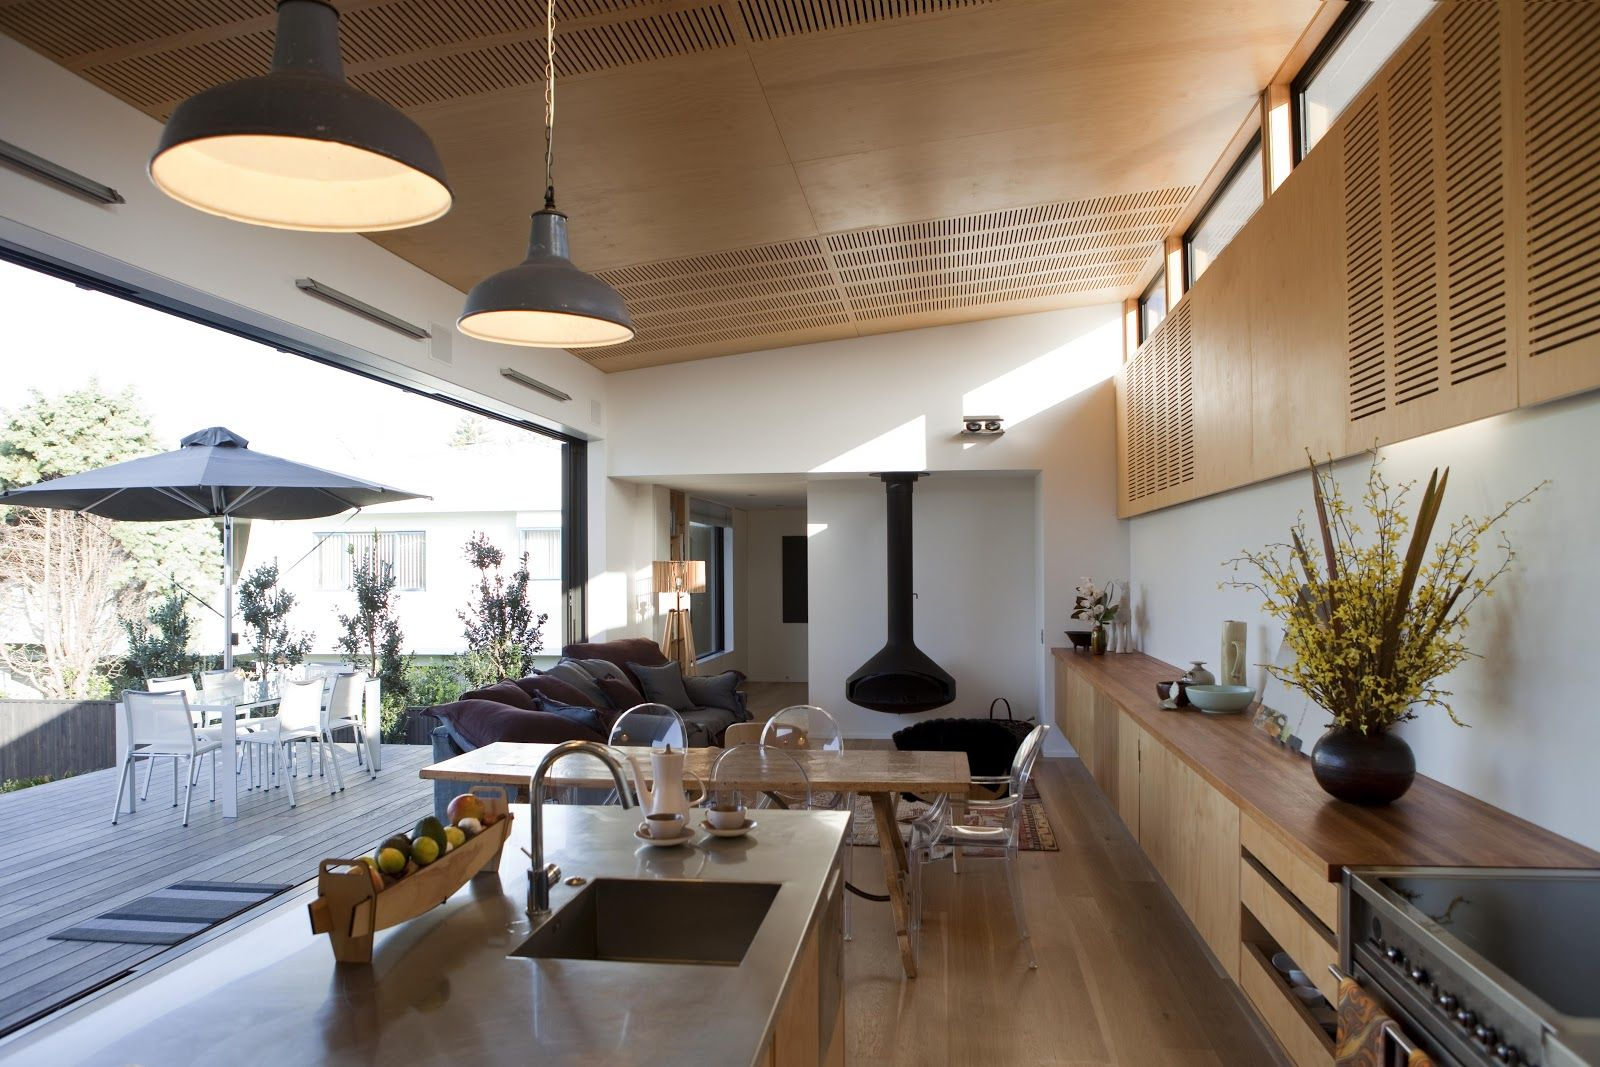 Architect evan mayo nz kitchen pinterest kitchen dining